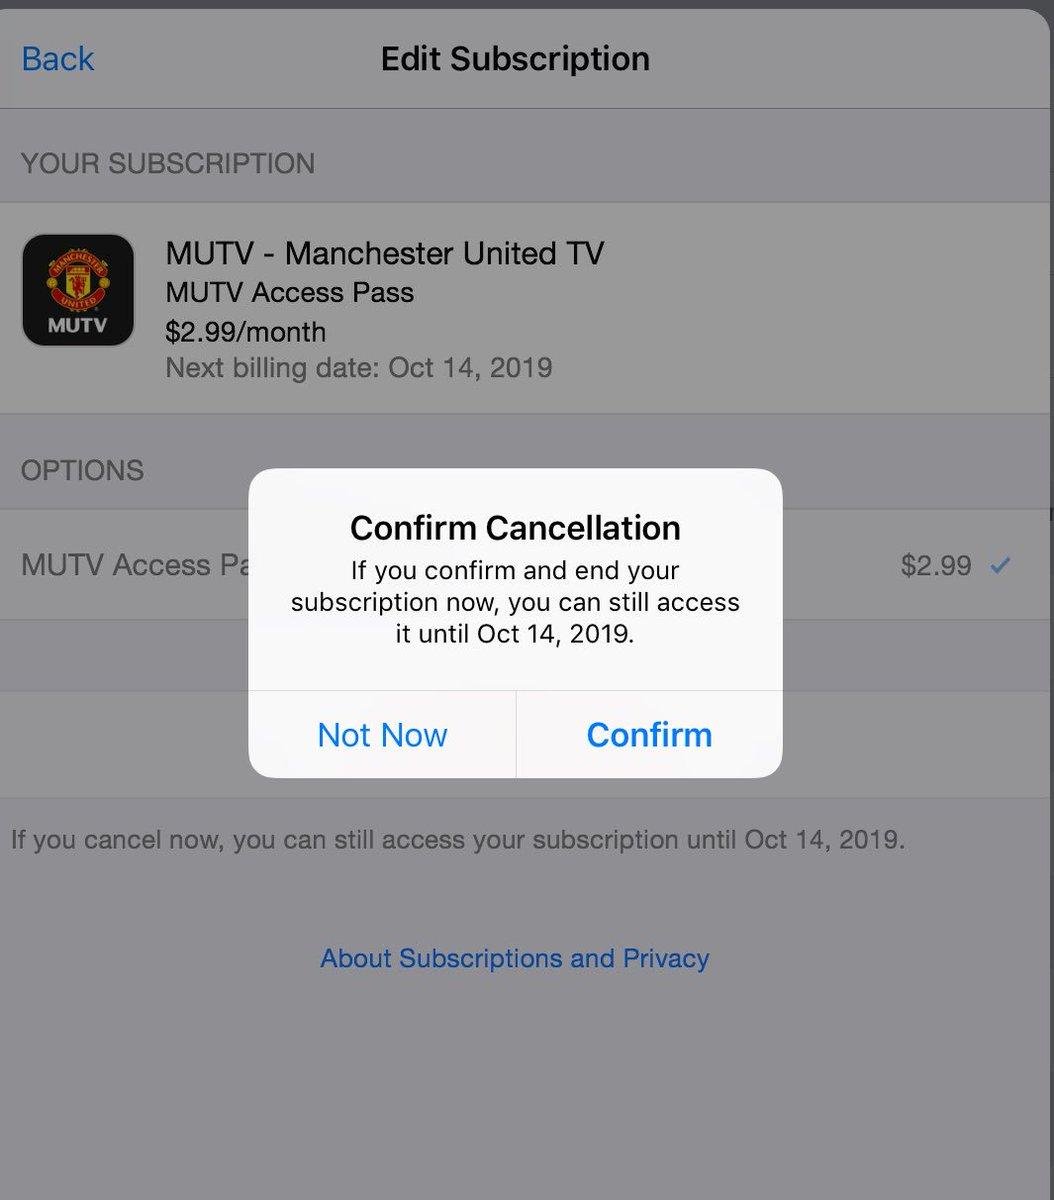 CANCELLED , CANCEL NOW #CancelMUTV #MUFC